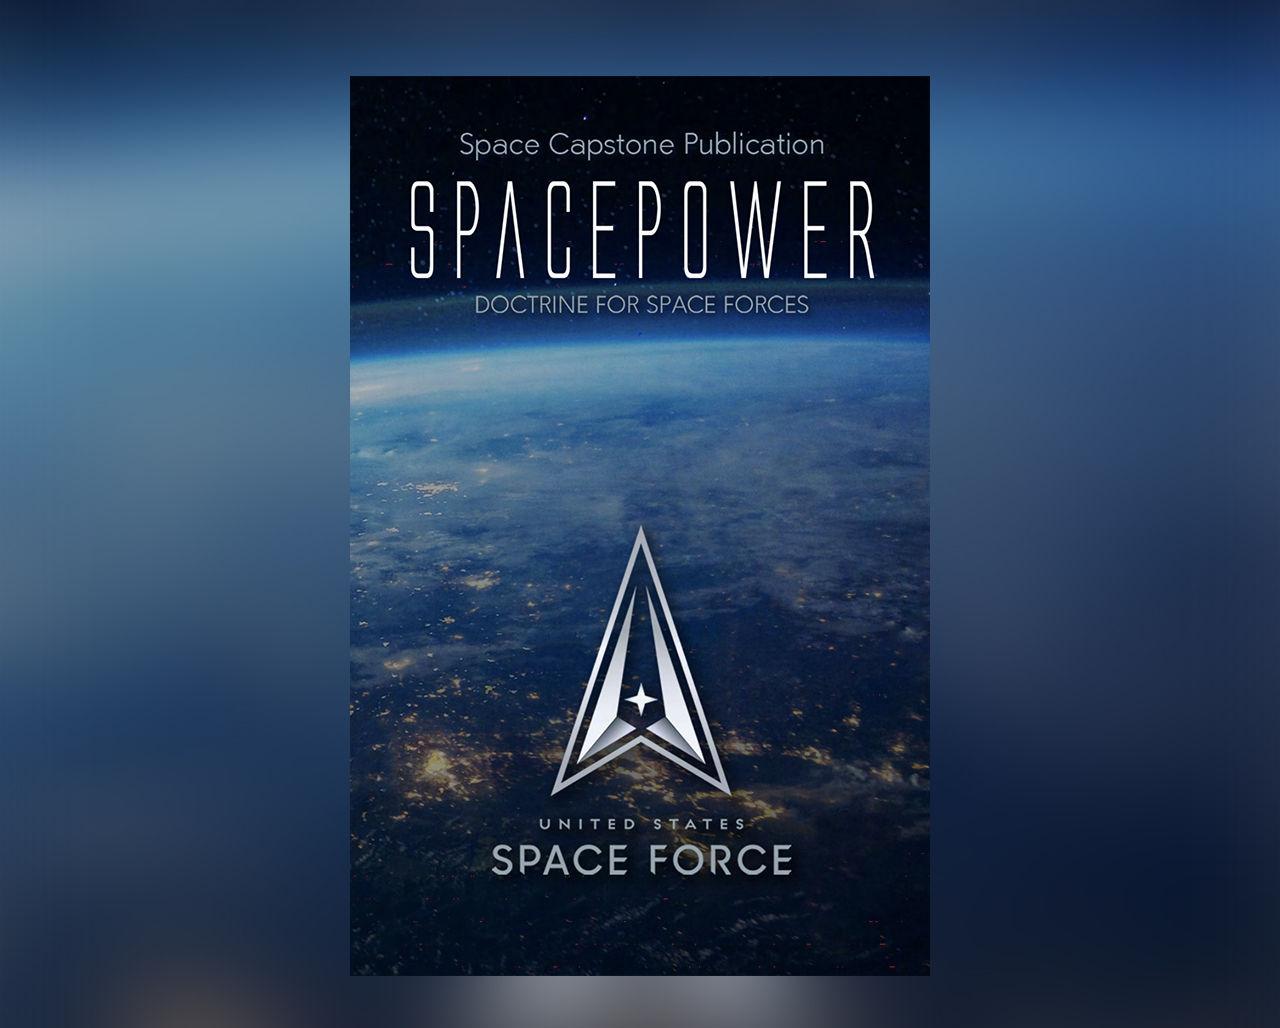 U.S. Space Force släpper rymdoktrin